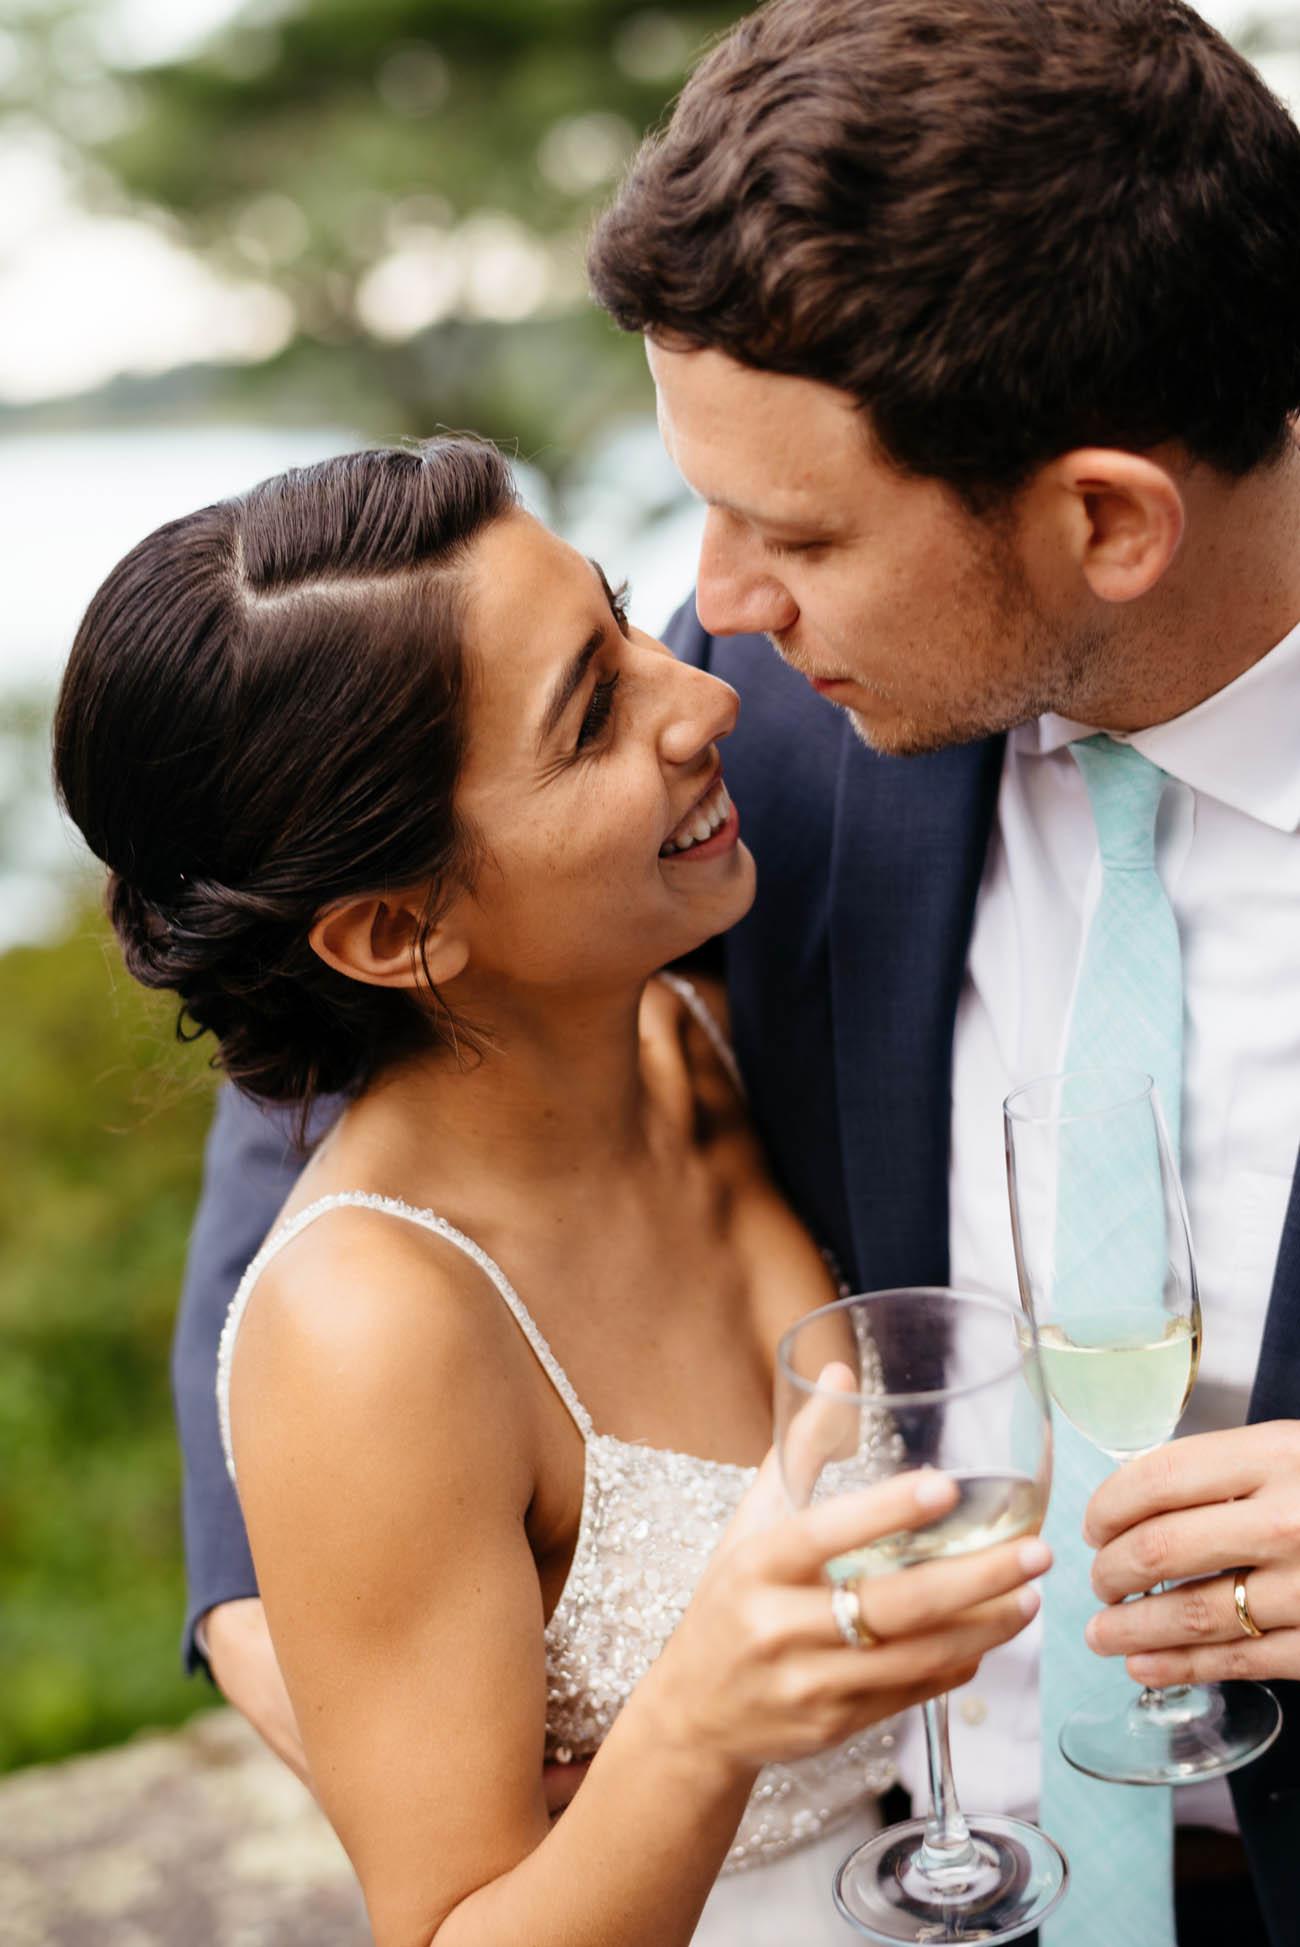 moraine_farm_beverly_weddings_059.JPG